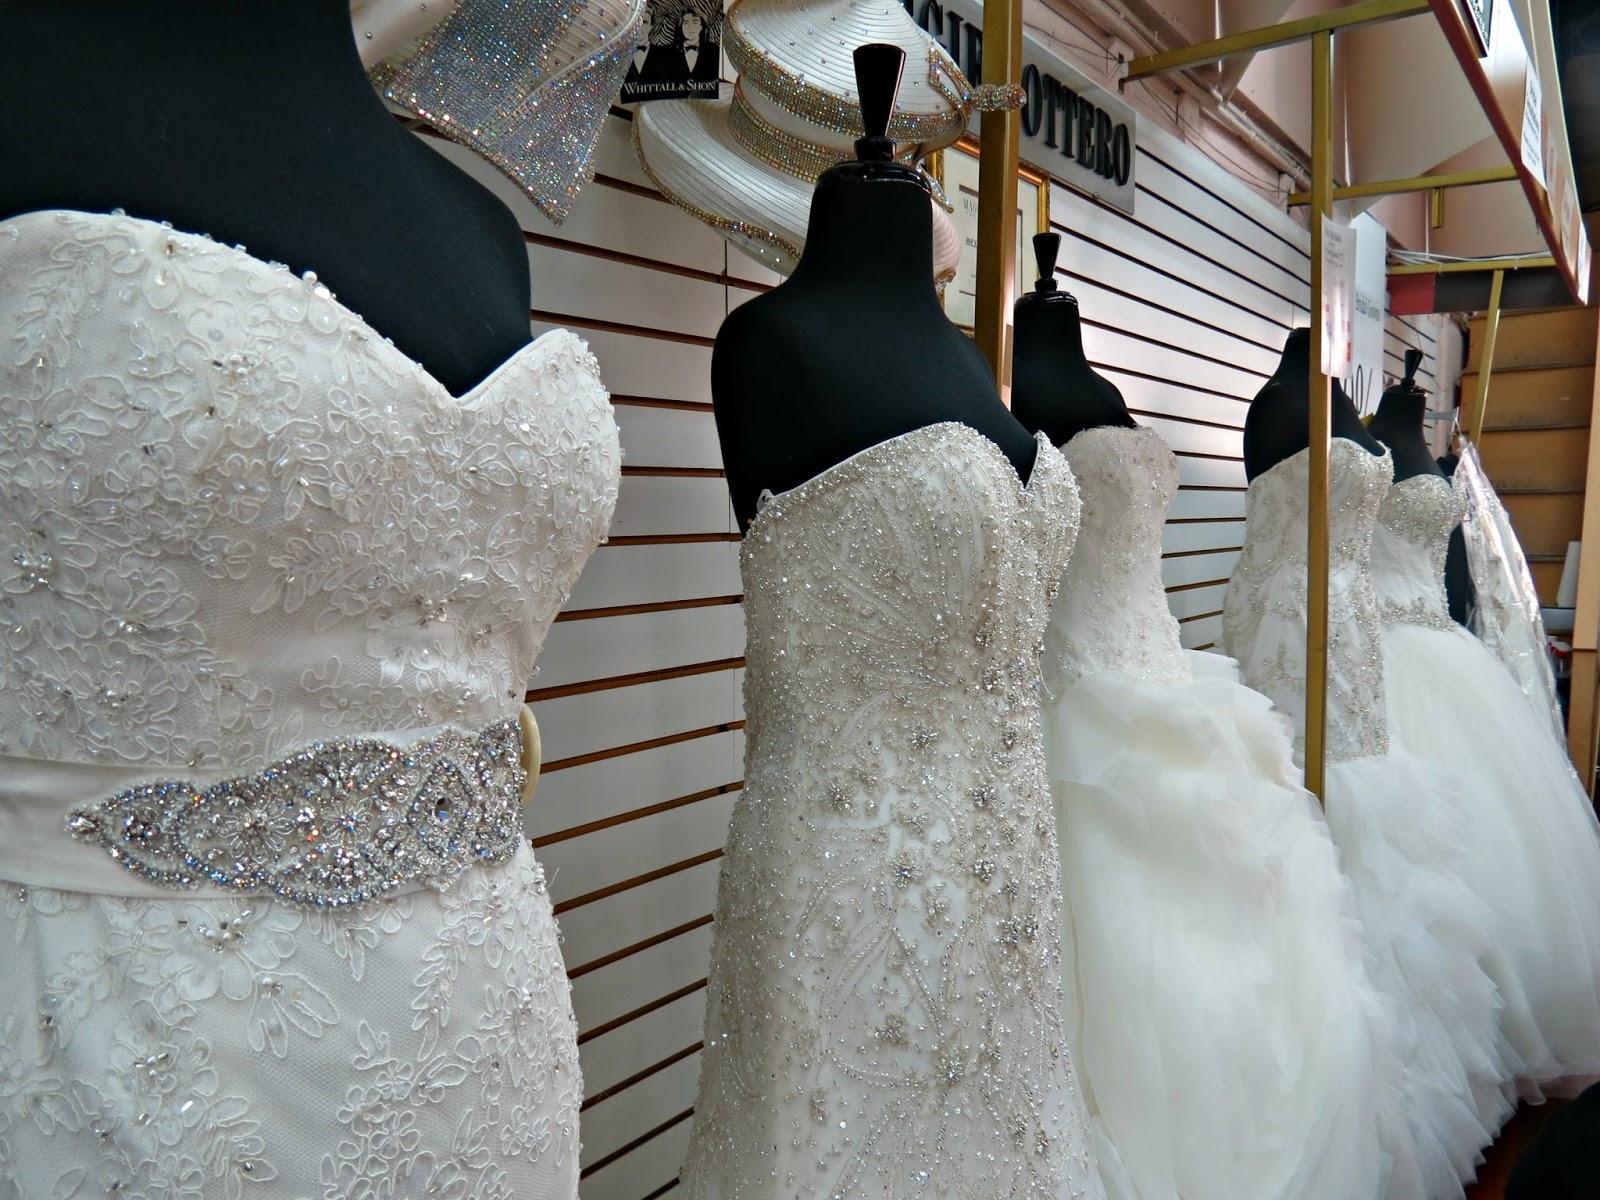 wedding dresses in los angeles garment district wedding dress garment bag Wedding Dresses In Los Angeles Garment District 52